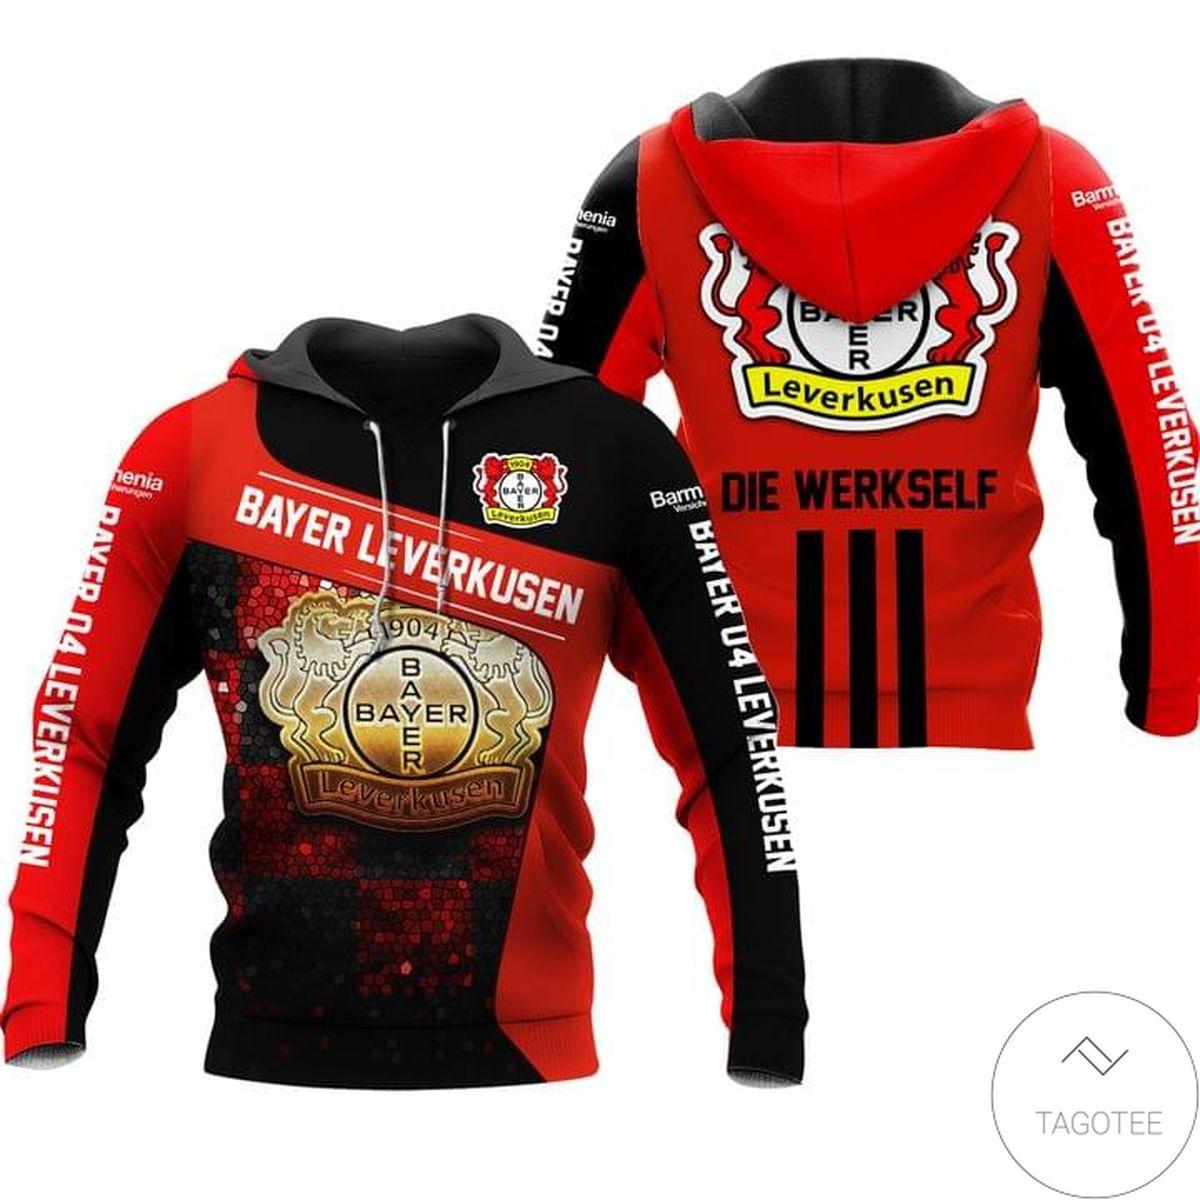 Bayer Leverkusen Hoodie